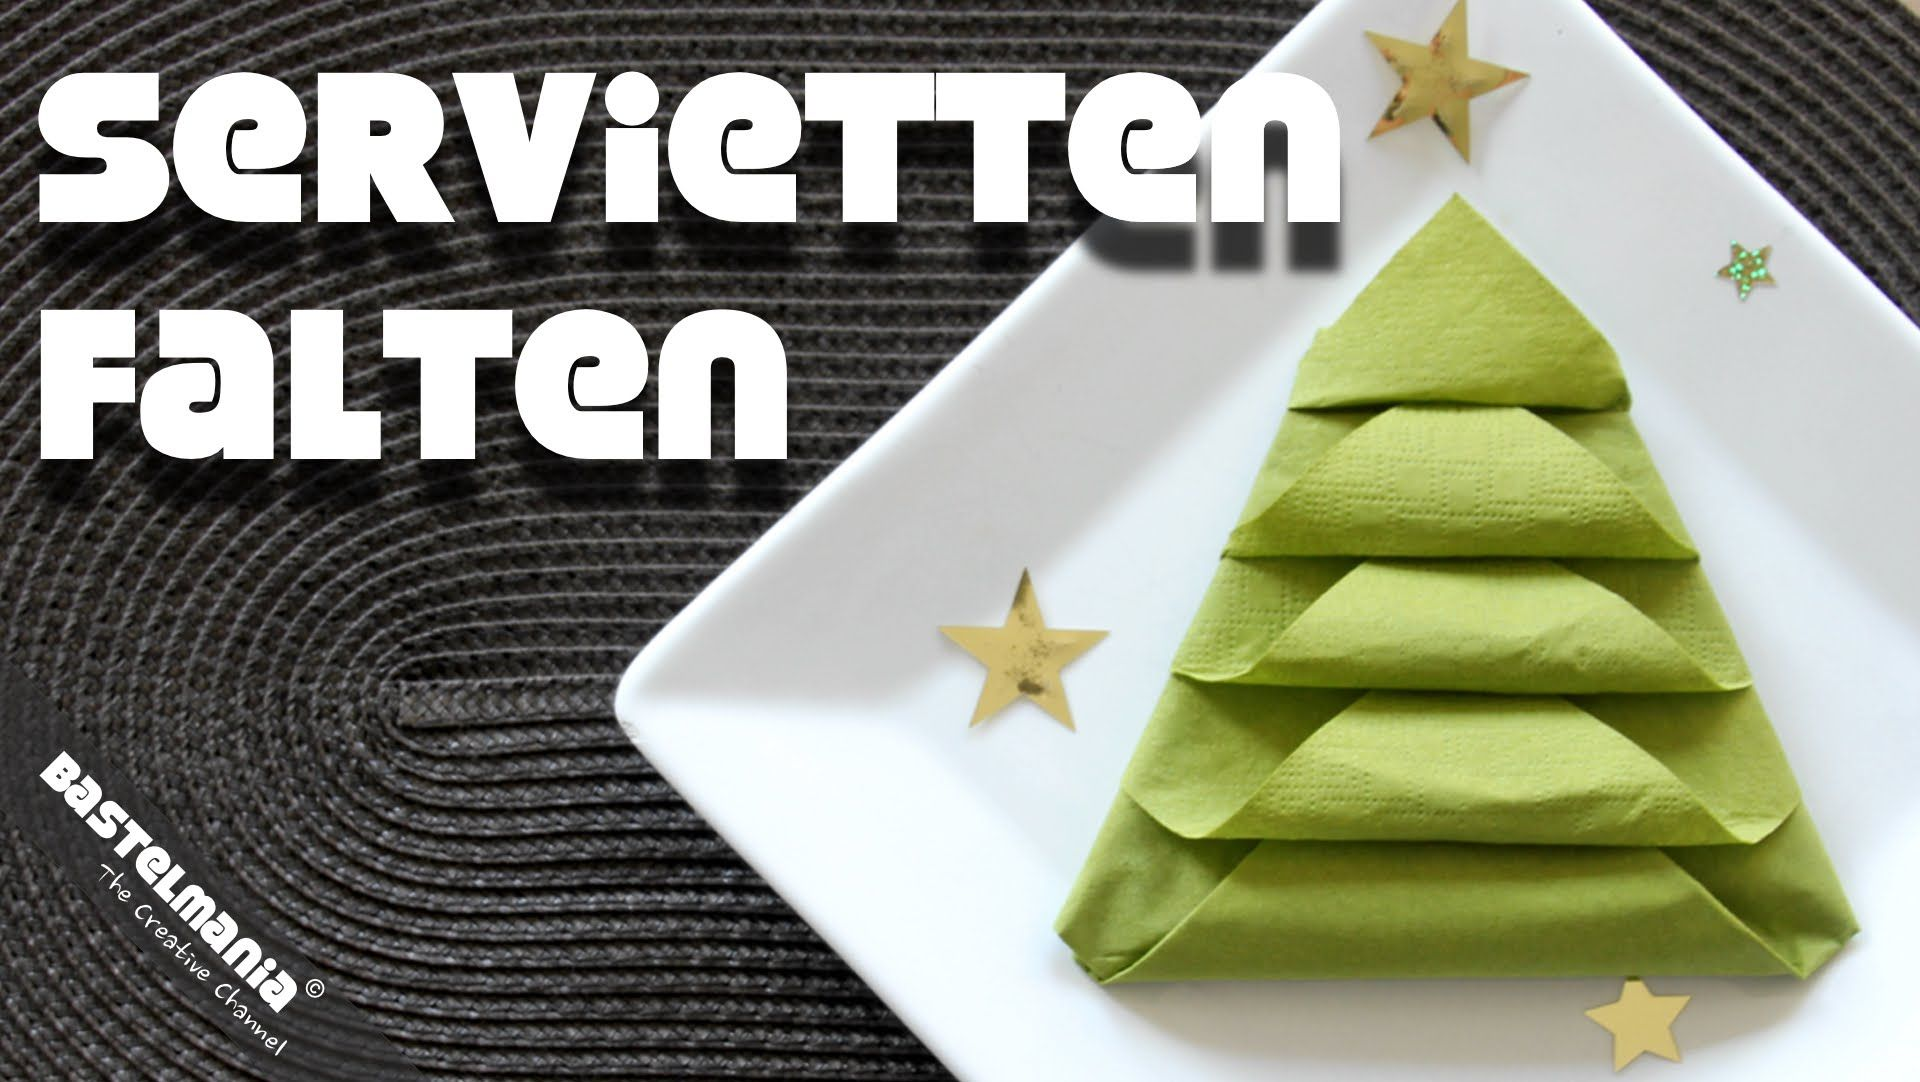 servietten falten anleitung tannenbaum weihnachten diy napkin folding instruction christmas tree. Black Bedroom Furniture Sets. Home Design Ideas